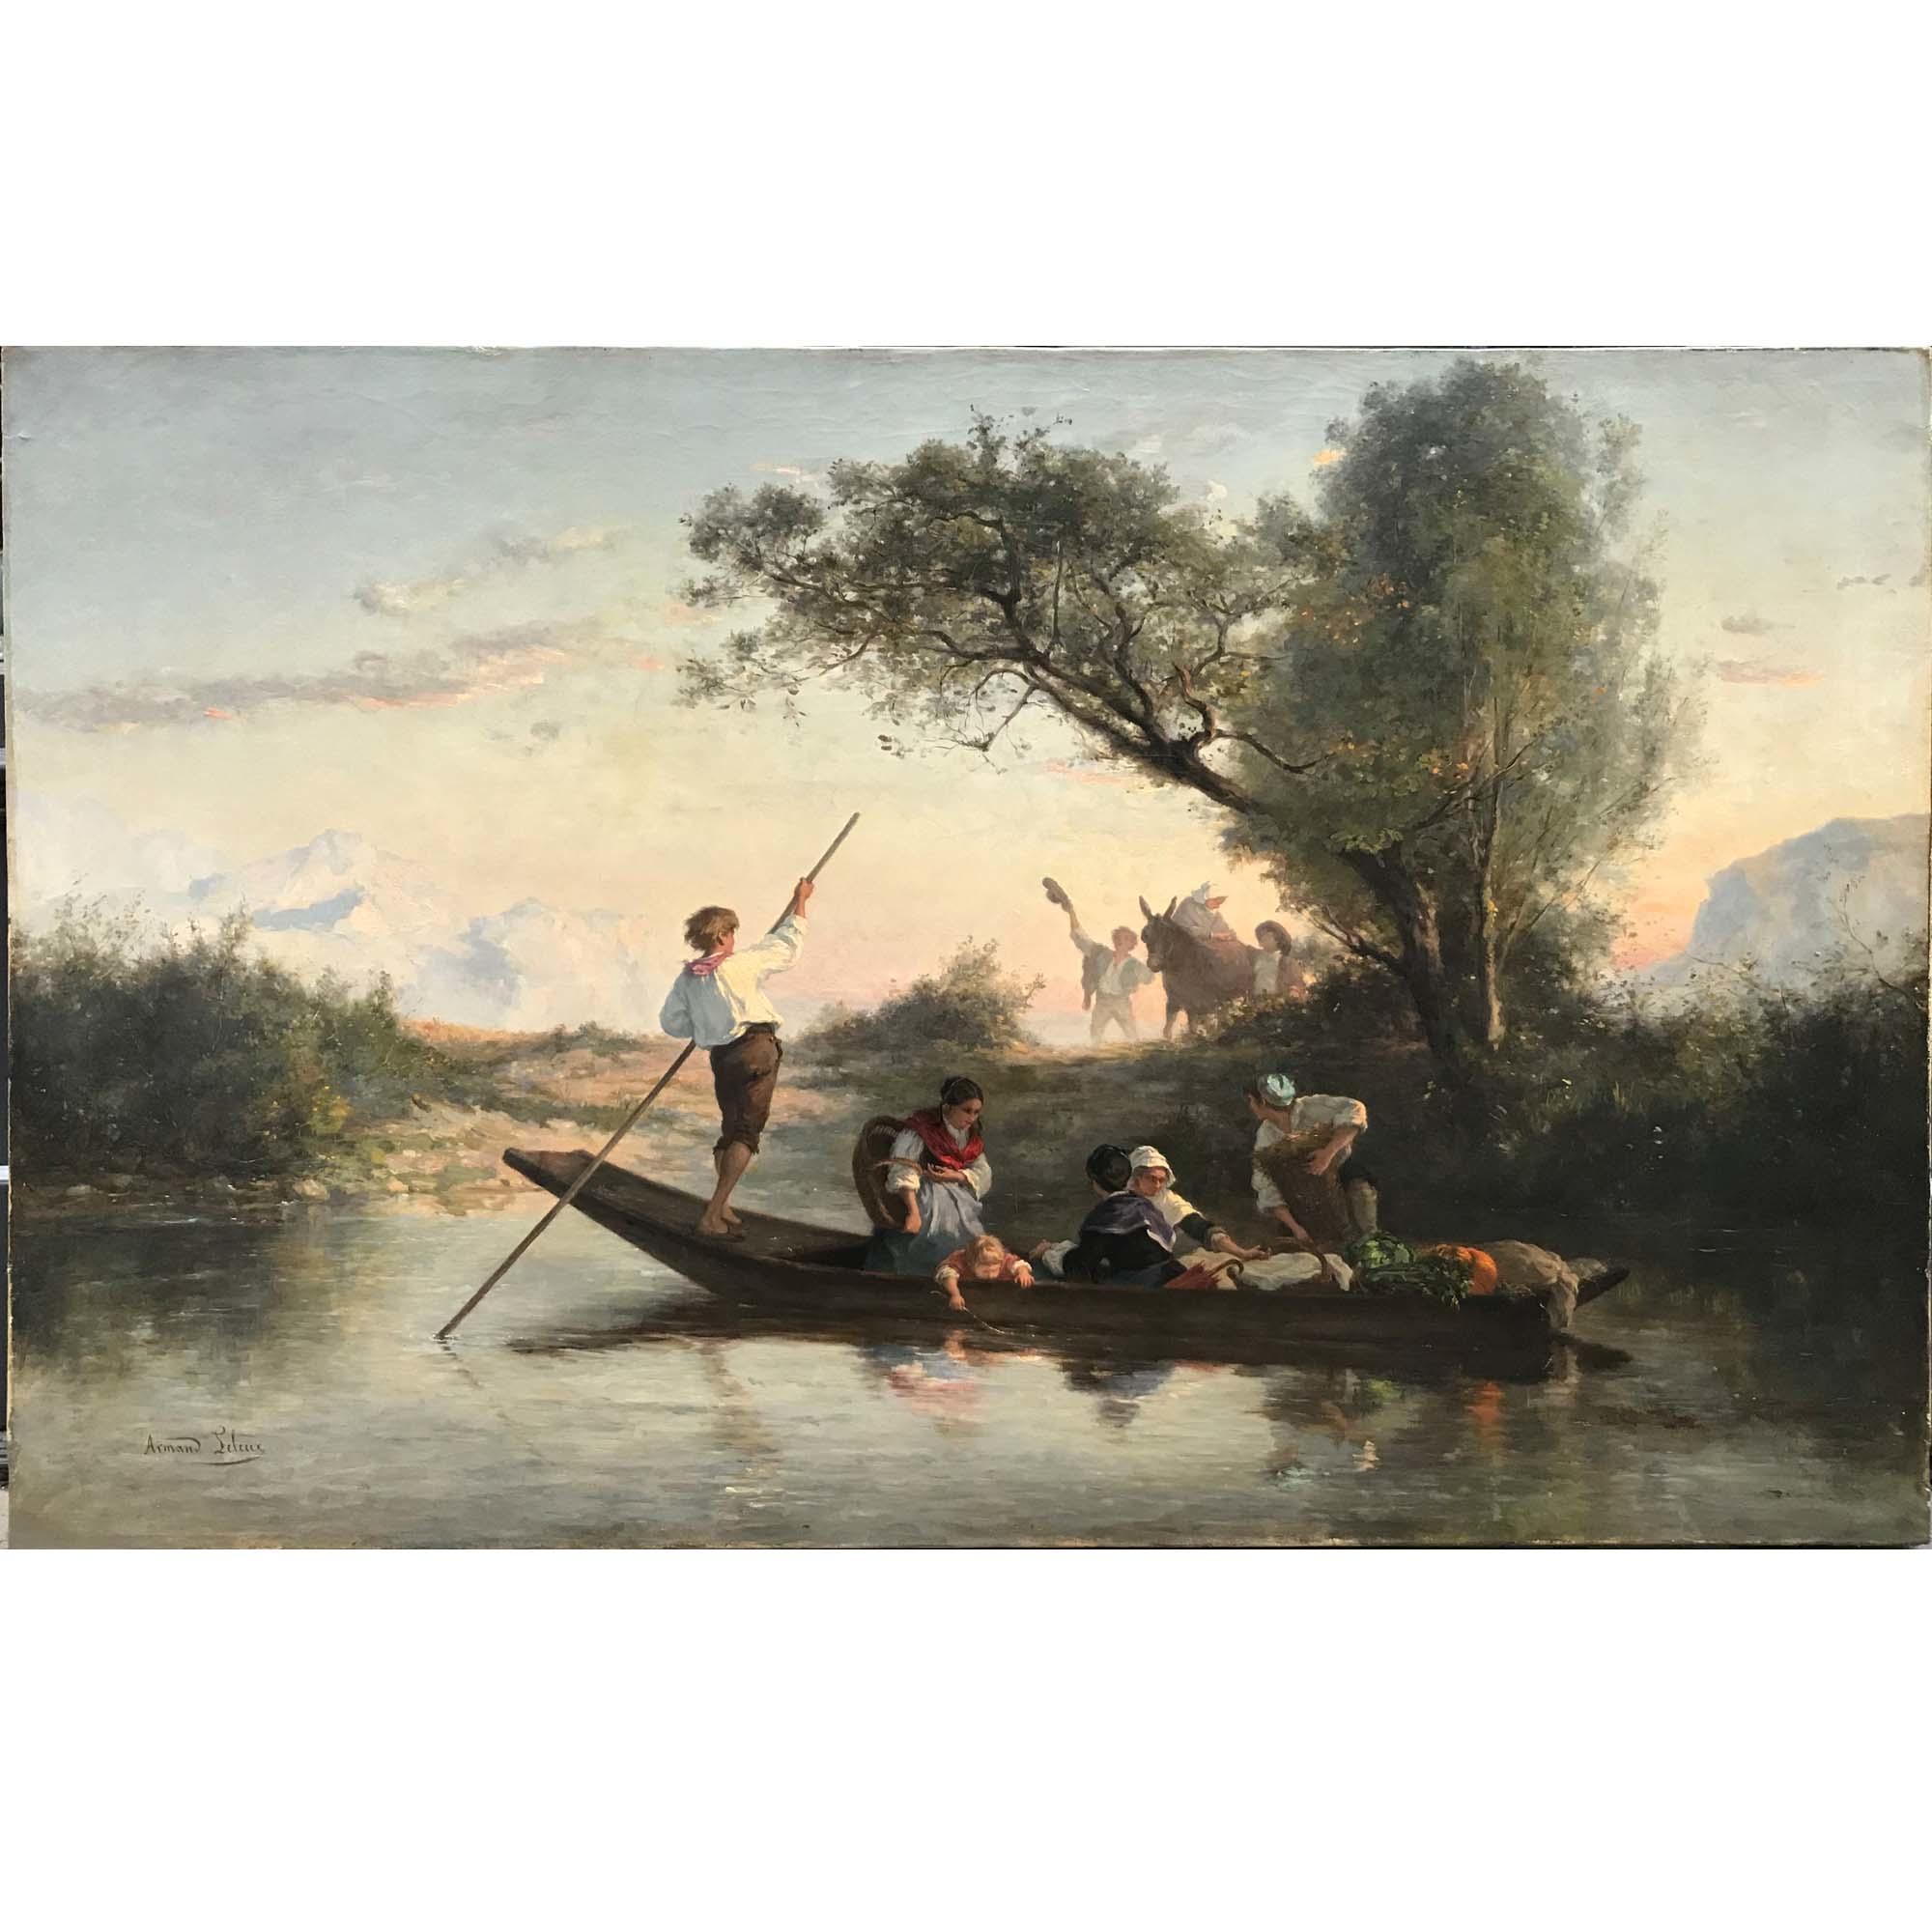 Armand Leleux, Promenade en barque, vers 1840